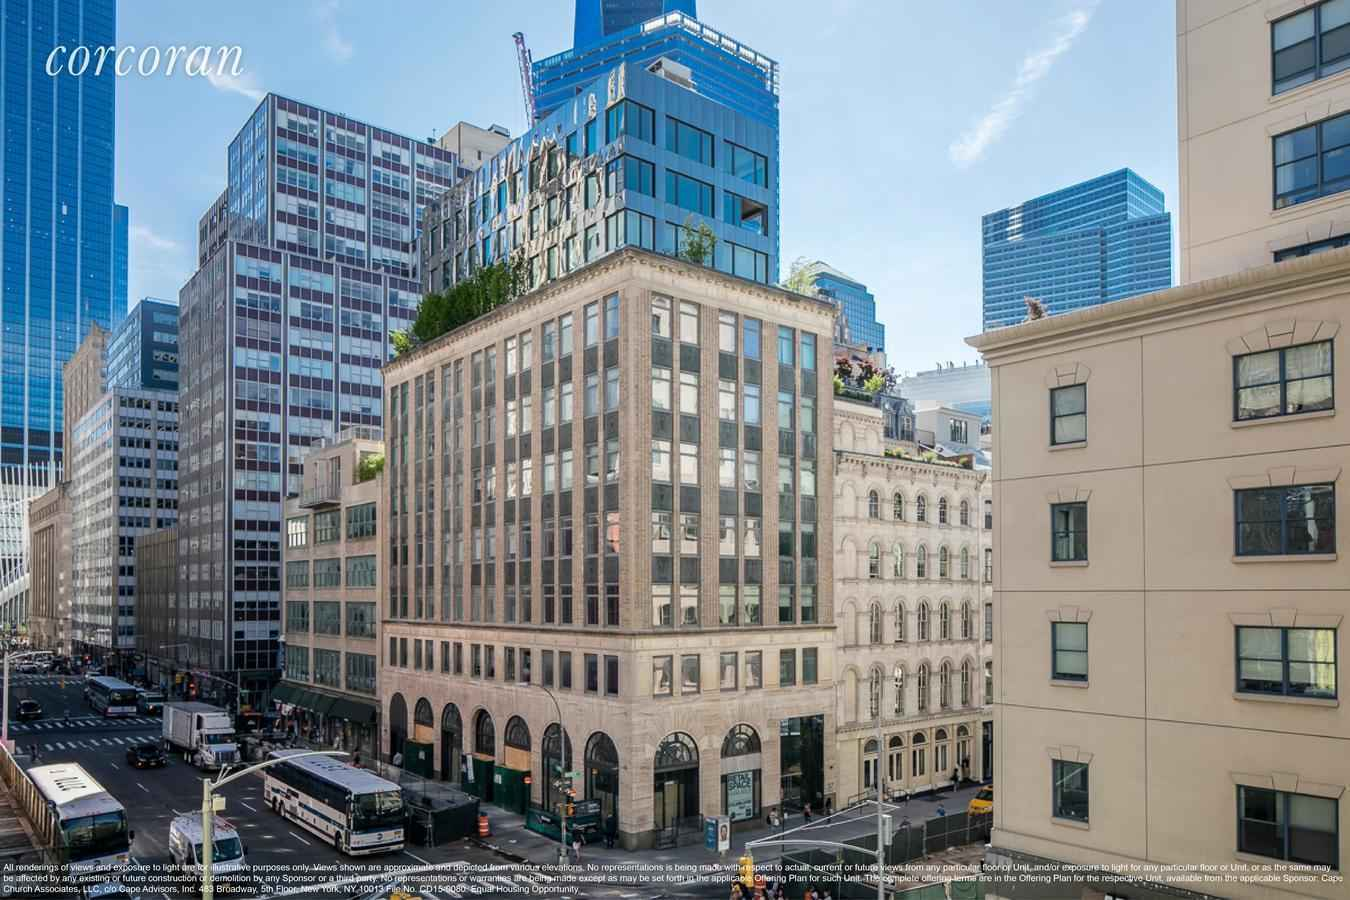 Apartment for sale at 30 Warren Street, Apt 5C